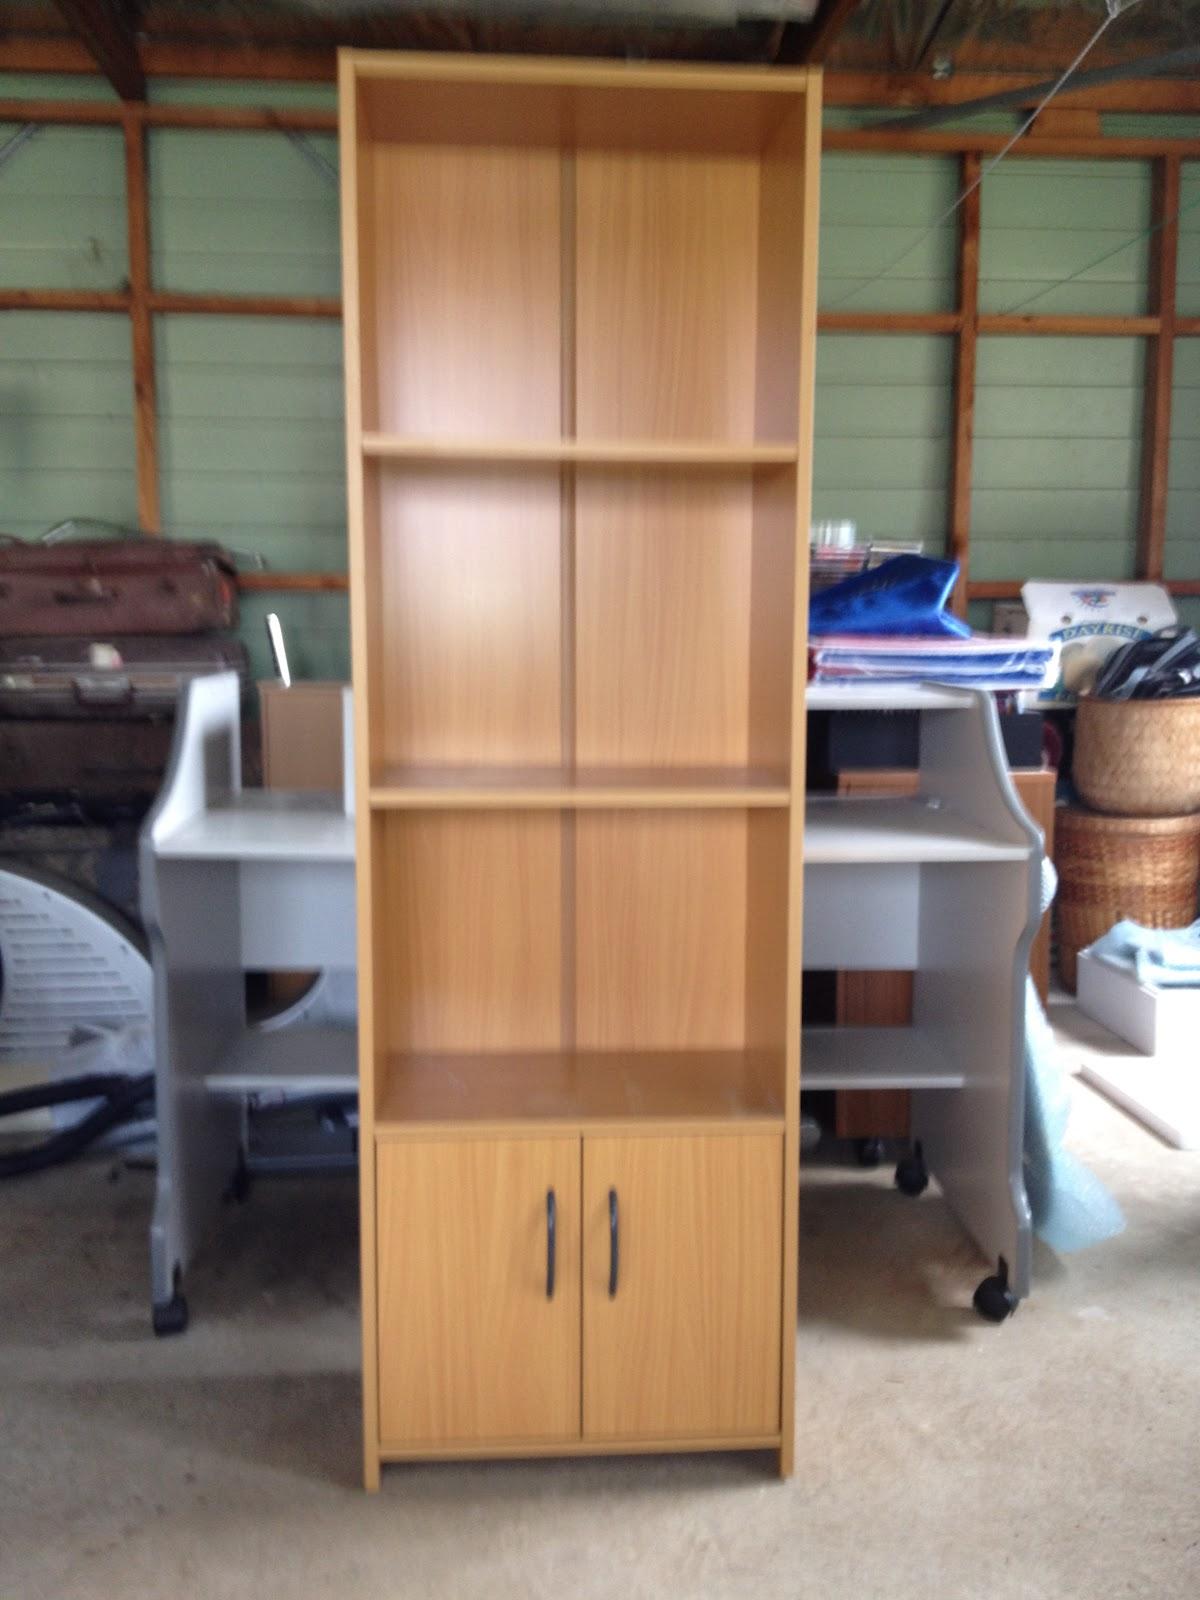 movingsalensw sold shelves cupboard bookshelf cabinet